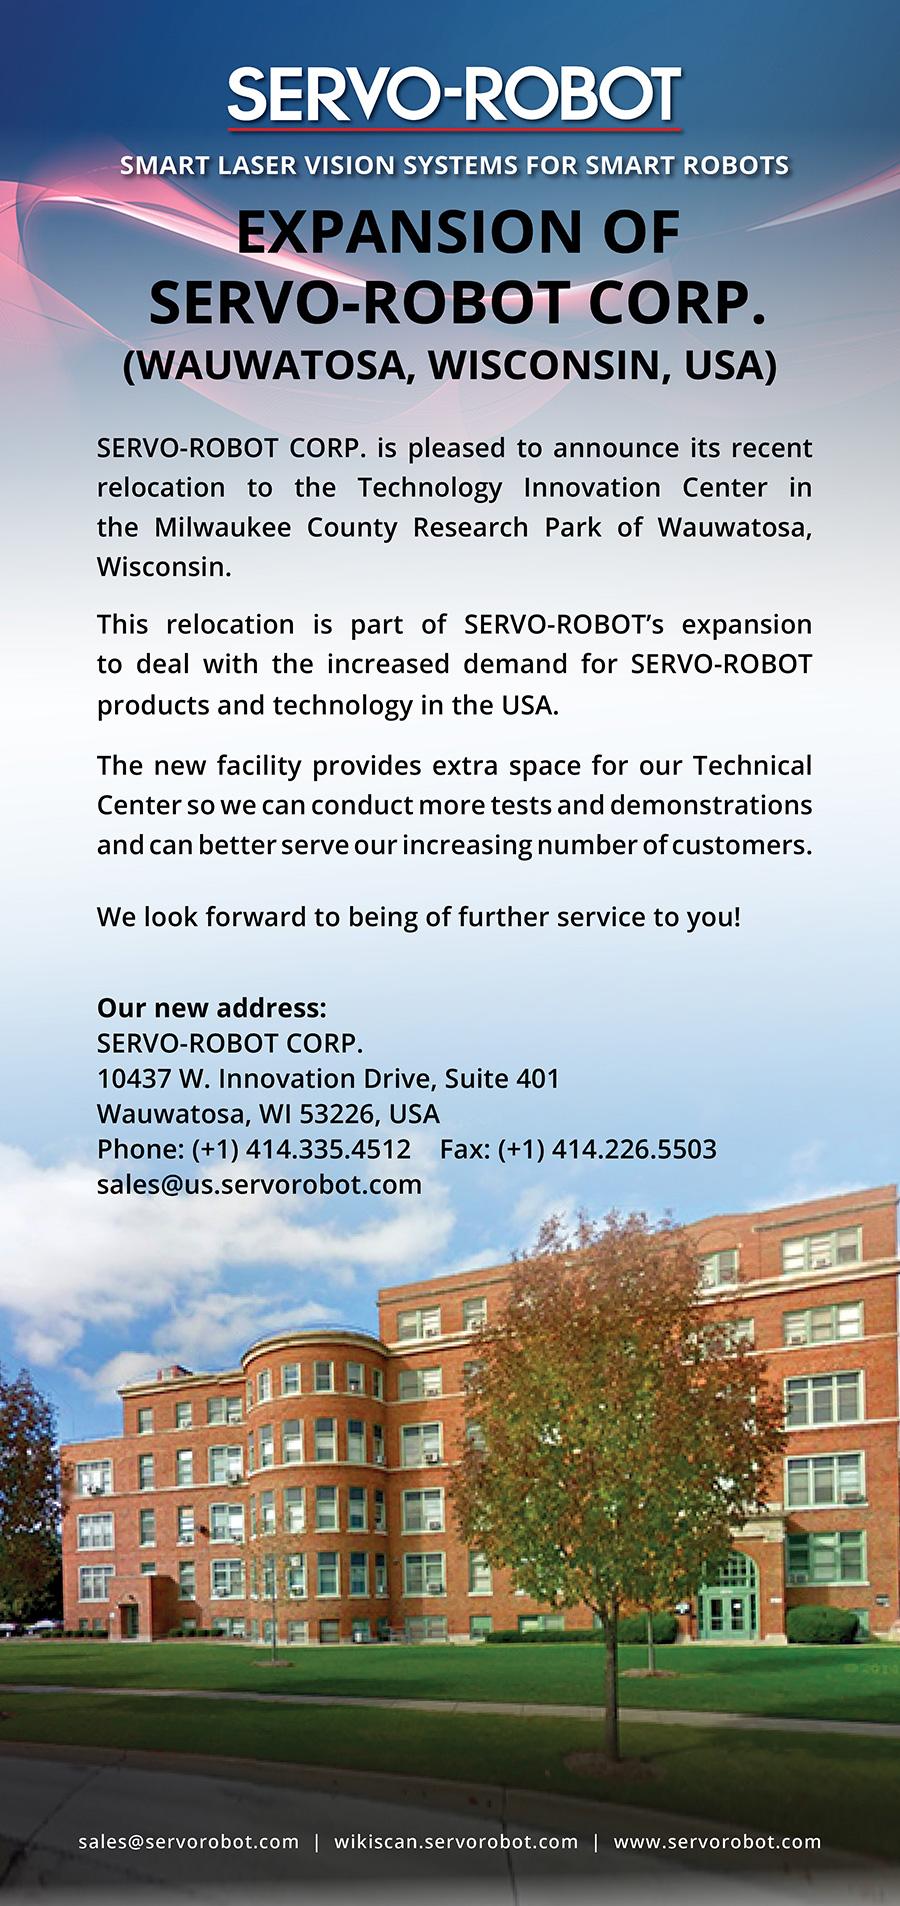 Expansion of SERVO-ROBOT CORP. (USA)